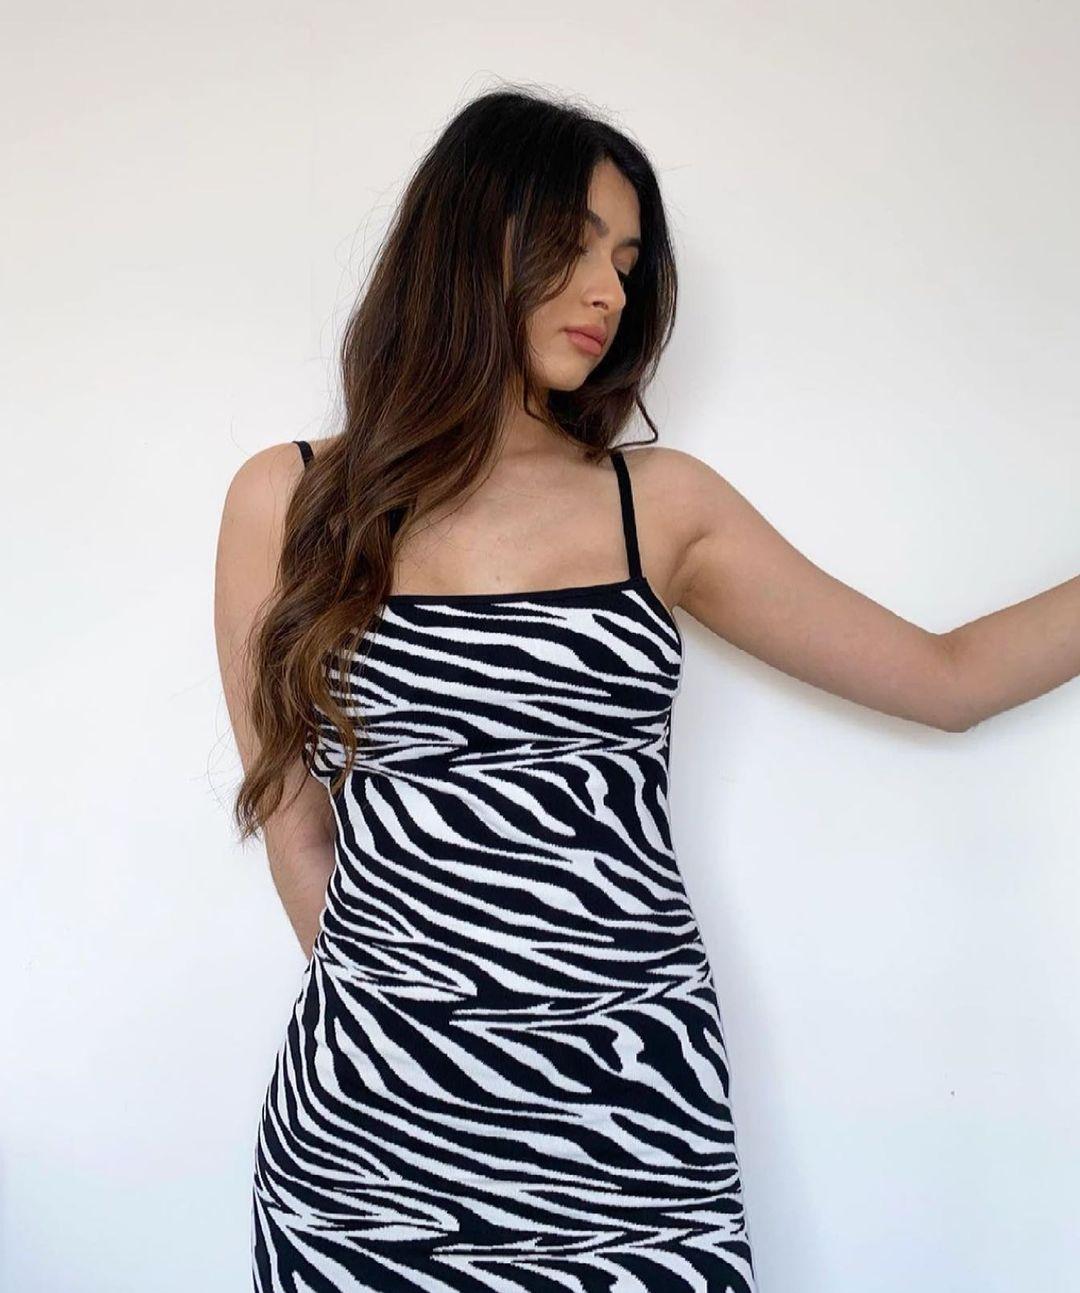 animal jacquard dress de Zara sur zara.style.daily